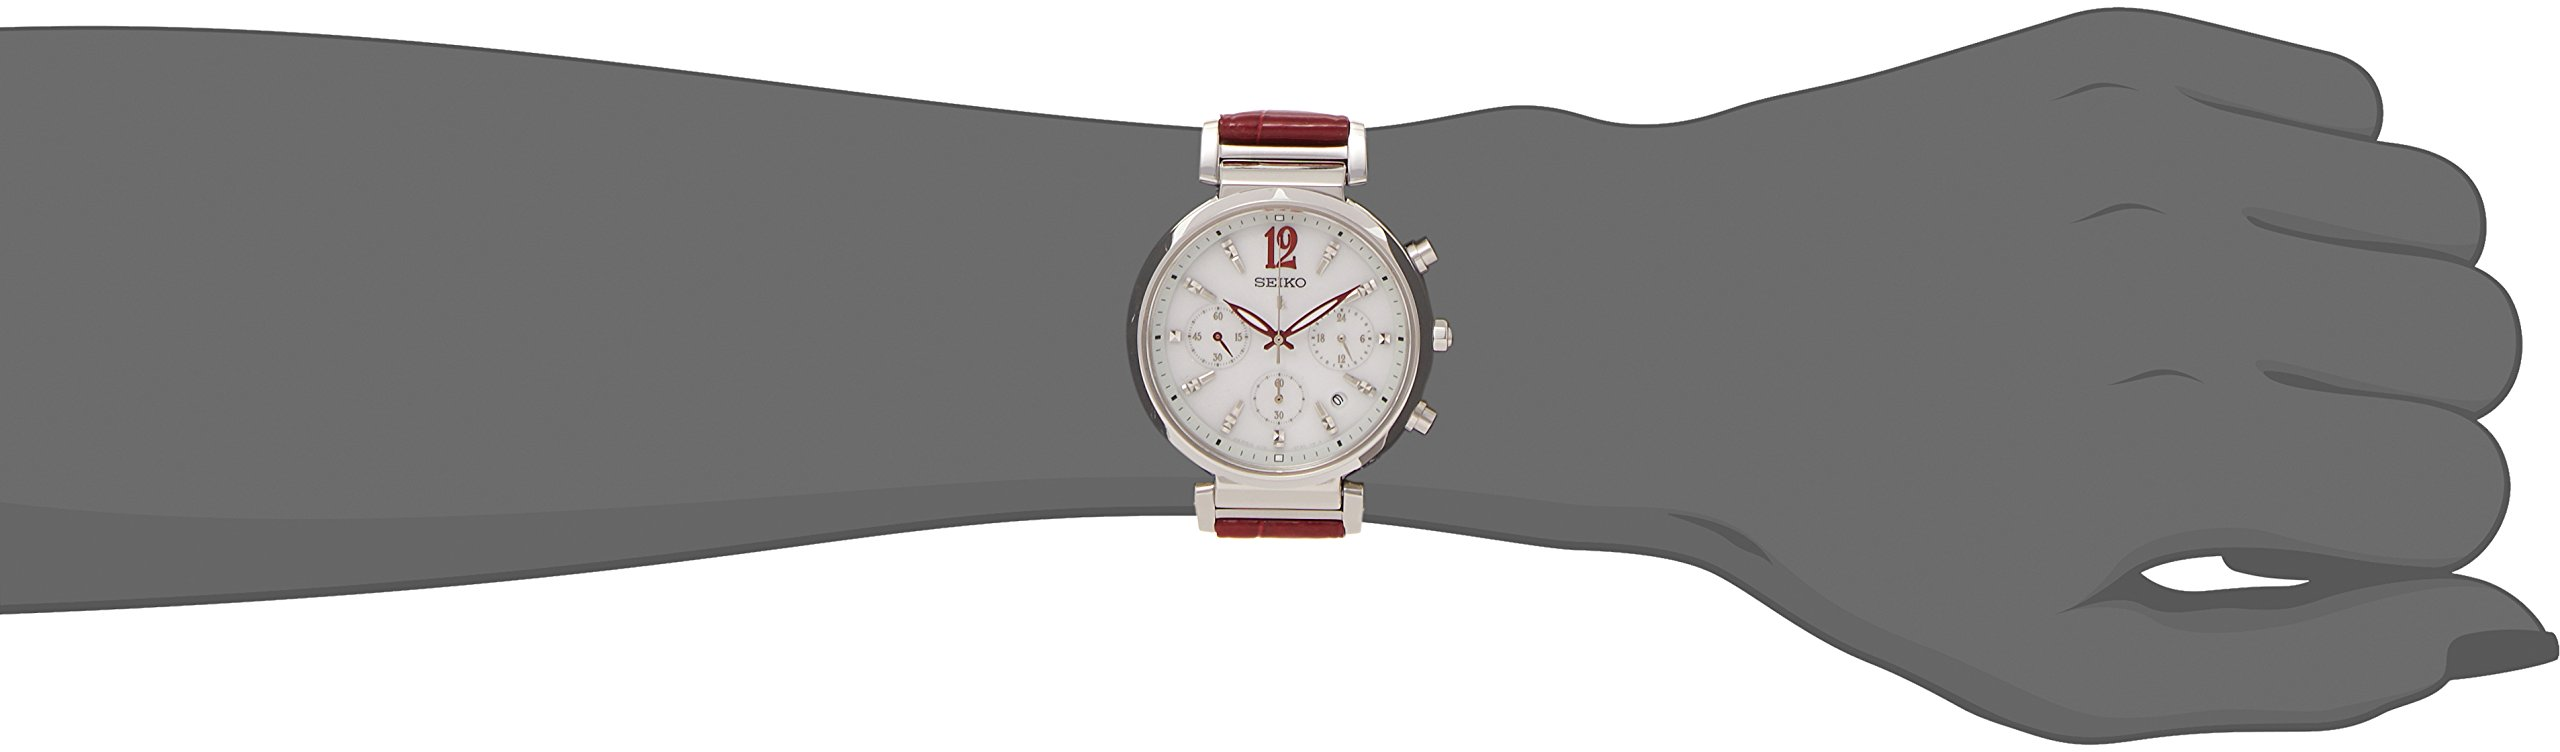 LUKIA solar watch SEIKO chronograph ladies type SSVS035 popularity by LUKIA